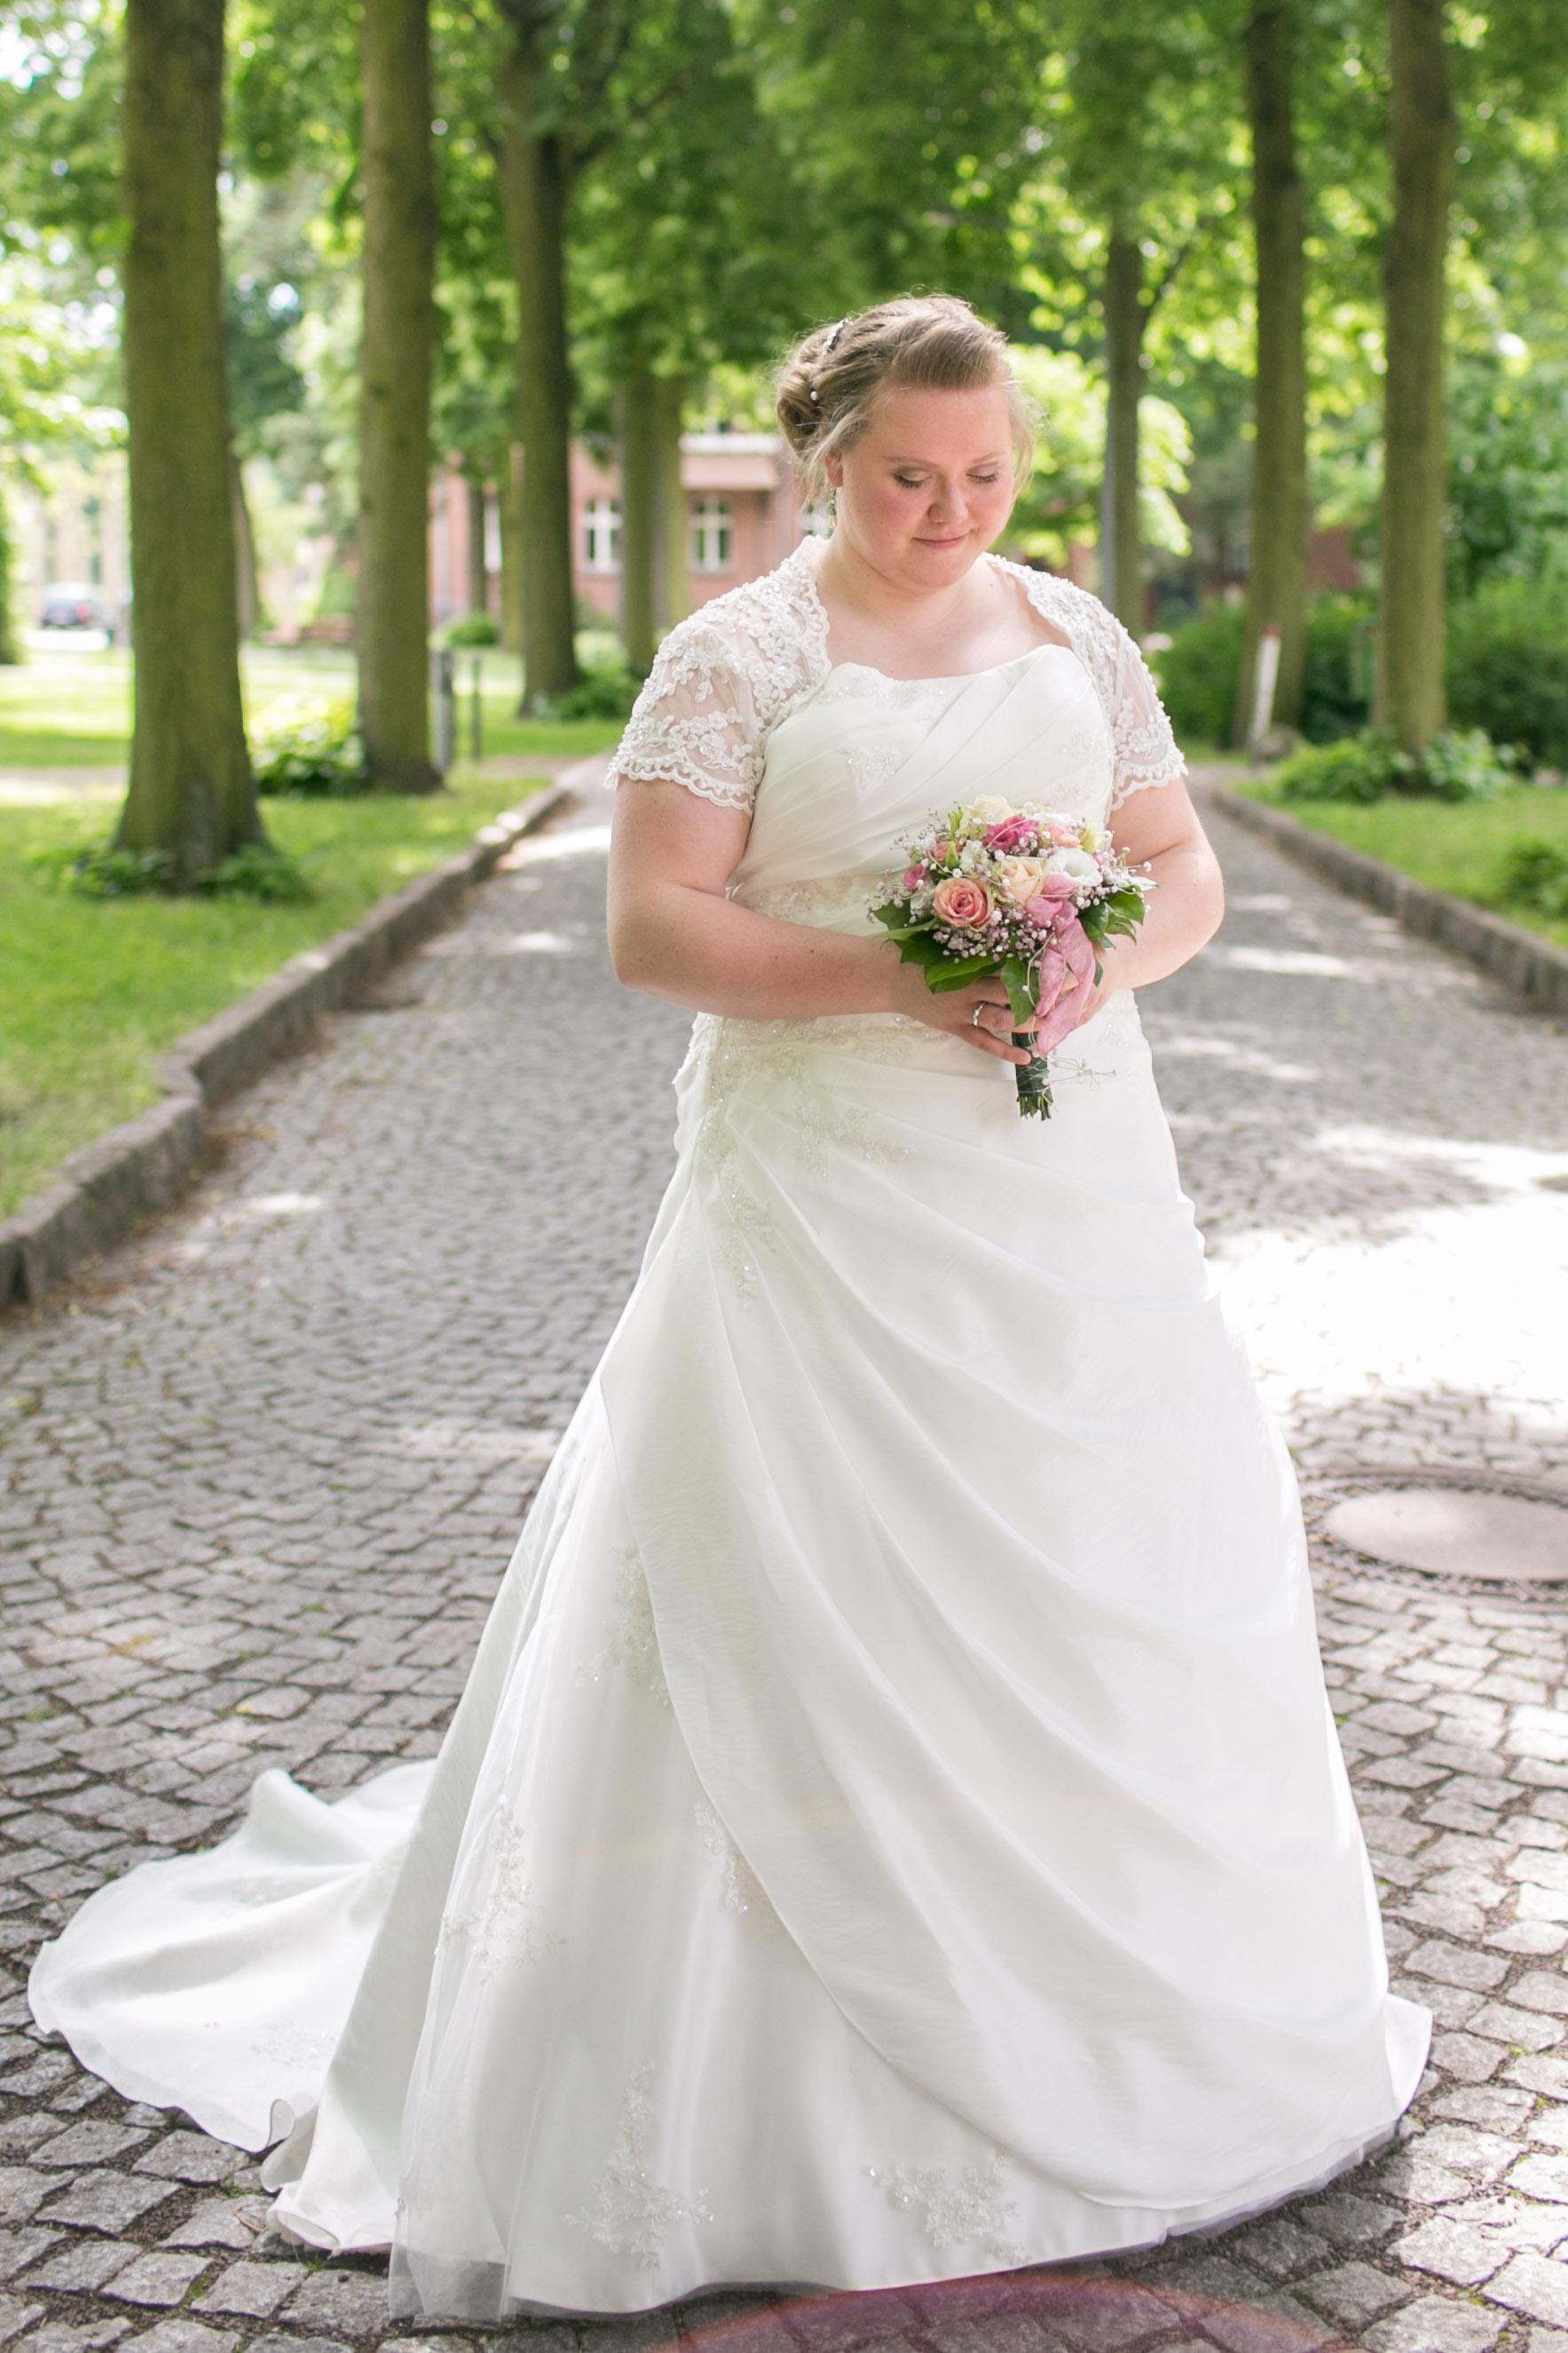 Berlin Hochzeitsfotografie_Fran Burrows-387.jpg